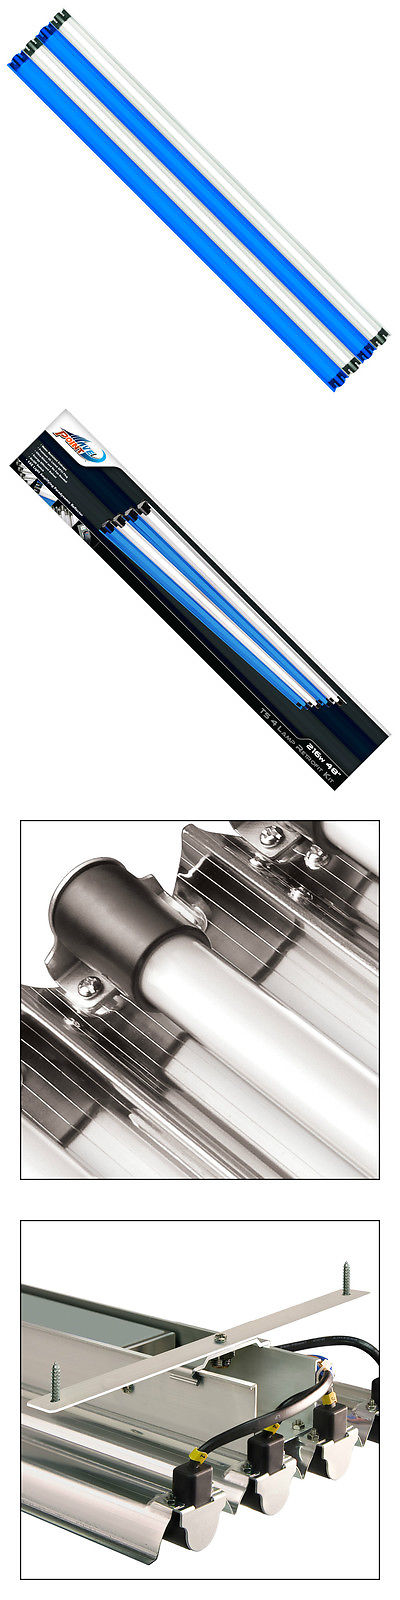 Lighting and Bulbs 46314: Wave Point 216-Watt (4X 54W) 48 Inch Ho T5 4-Lamp Retrofit Kit (W-10213) -> BUY IT NOW ONLY: $169.99 on eBay!